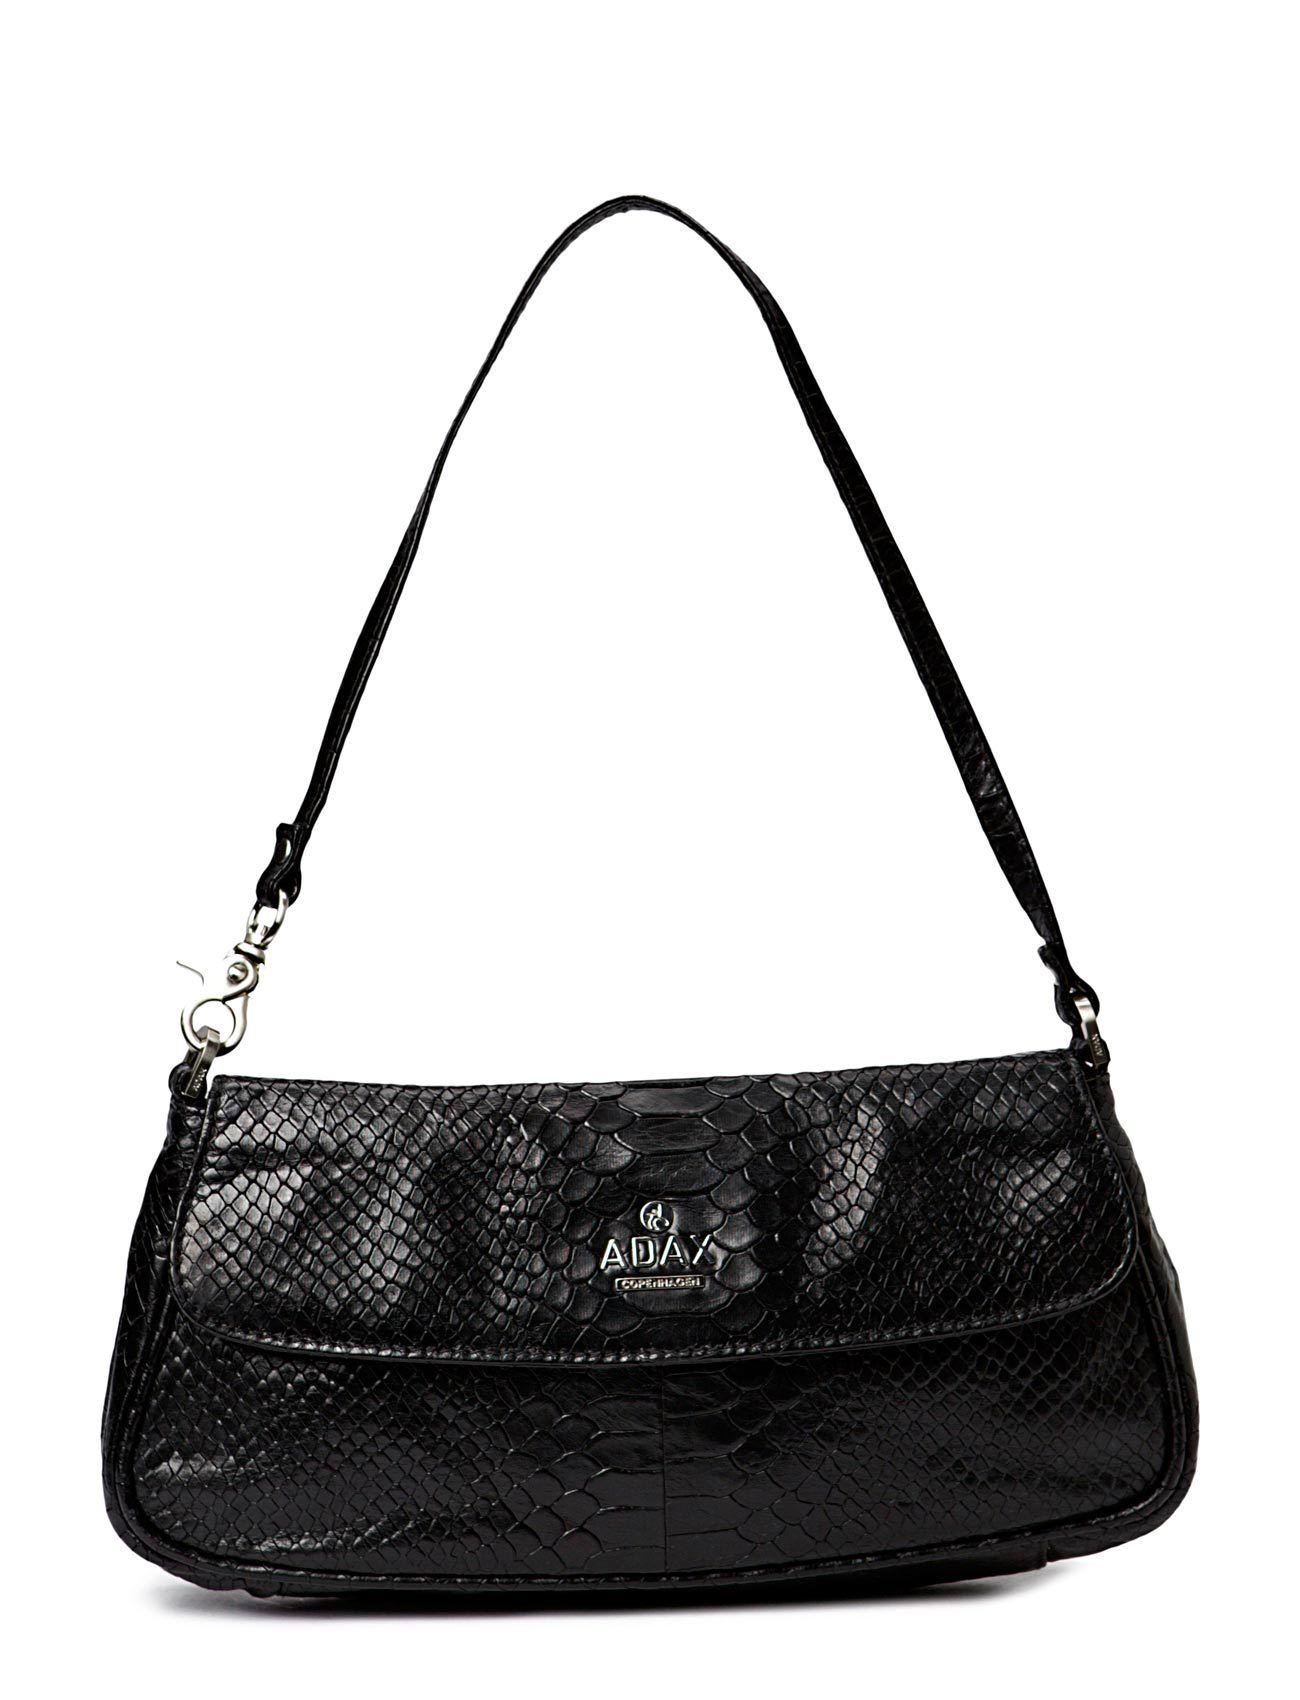 ddbdec9c7cd Navy faux suede clutch bag Navy suede clutch bag with bow shoulder strap